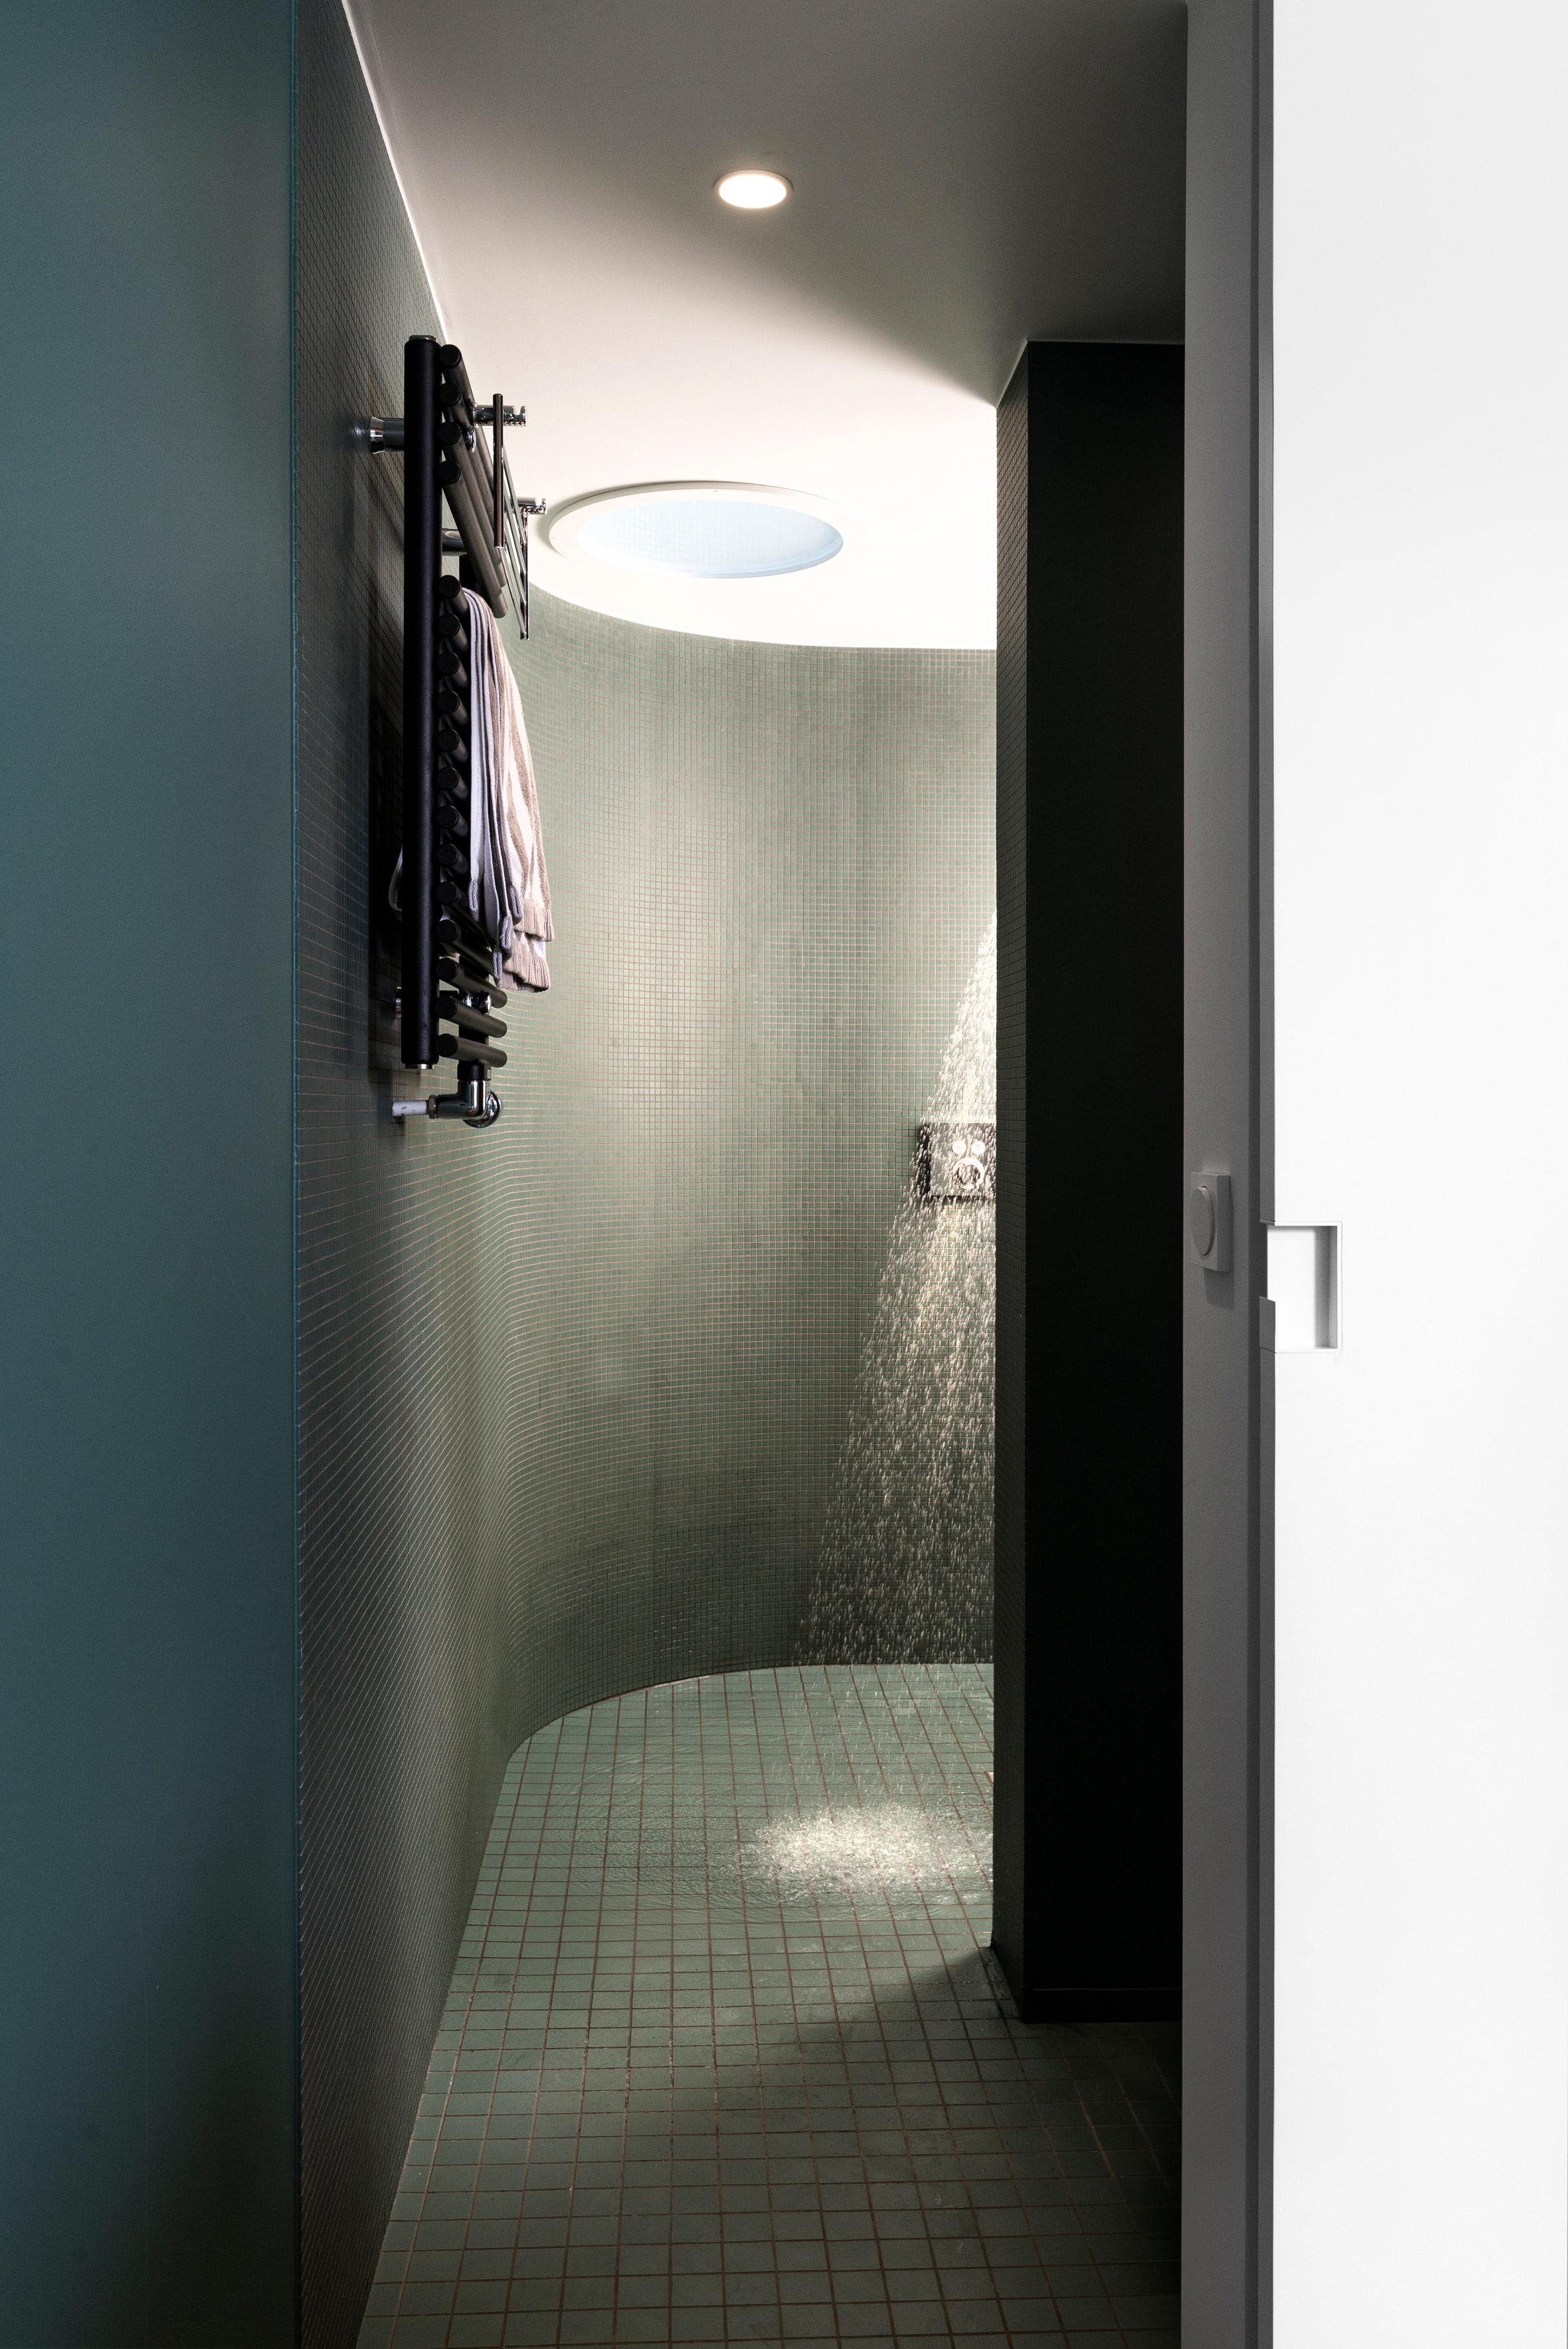 architecture-semi-detached-house-with-an-outdoor-areadesign-studia-interiors-osnovadesign-osnova-poltava_11